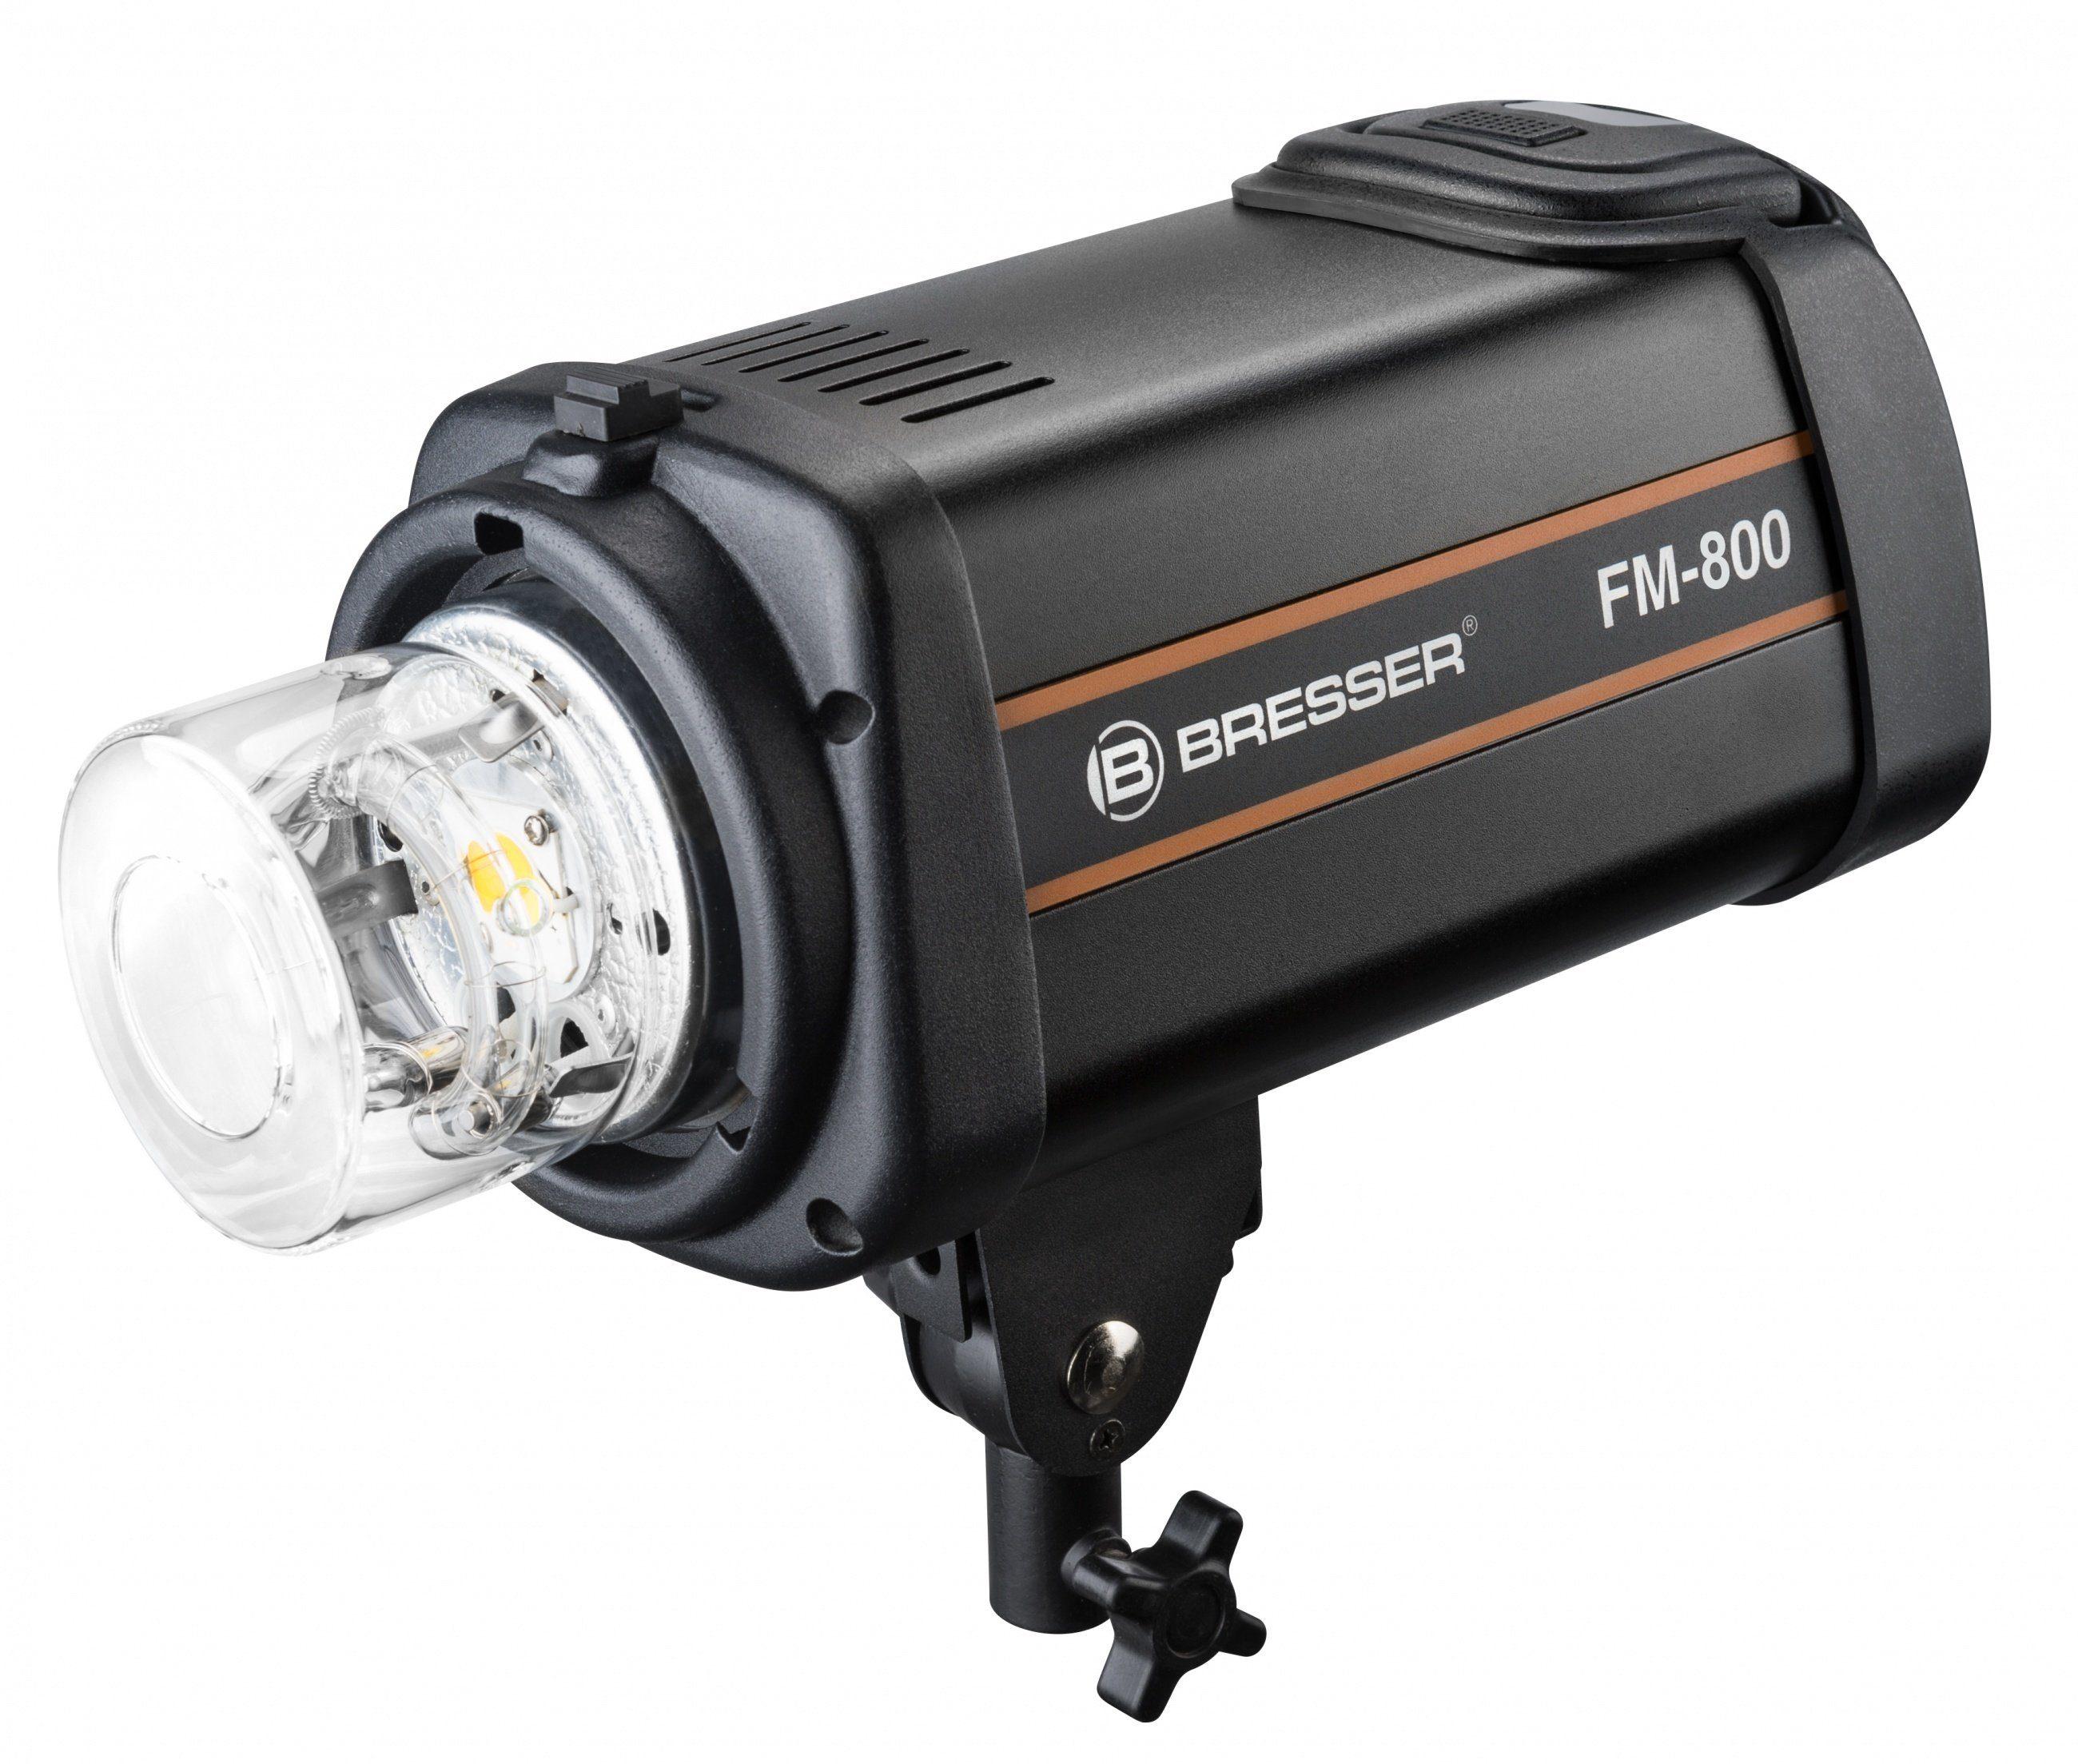 Bresser Fotostudio »FM-800 High Speed Studioblitz«